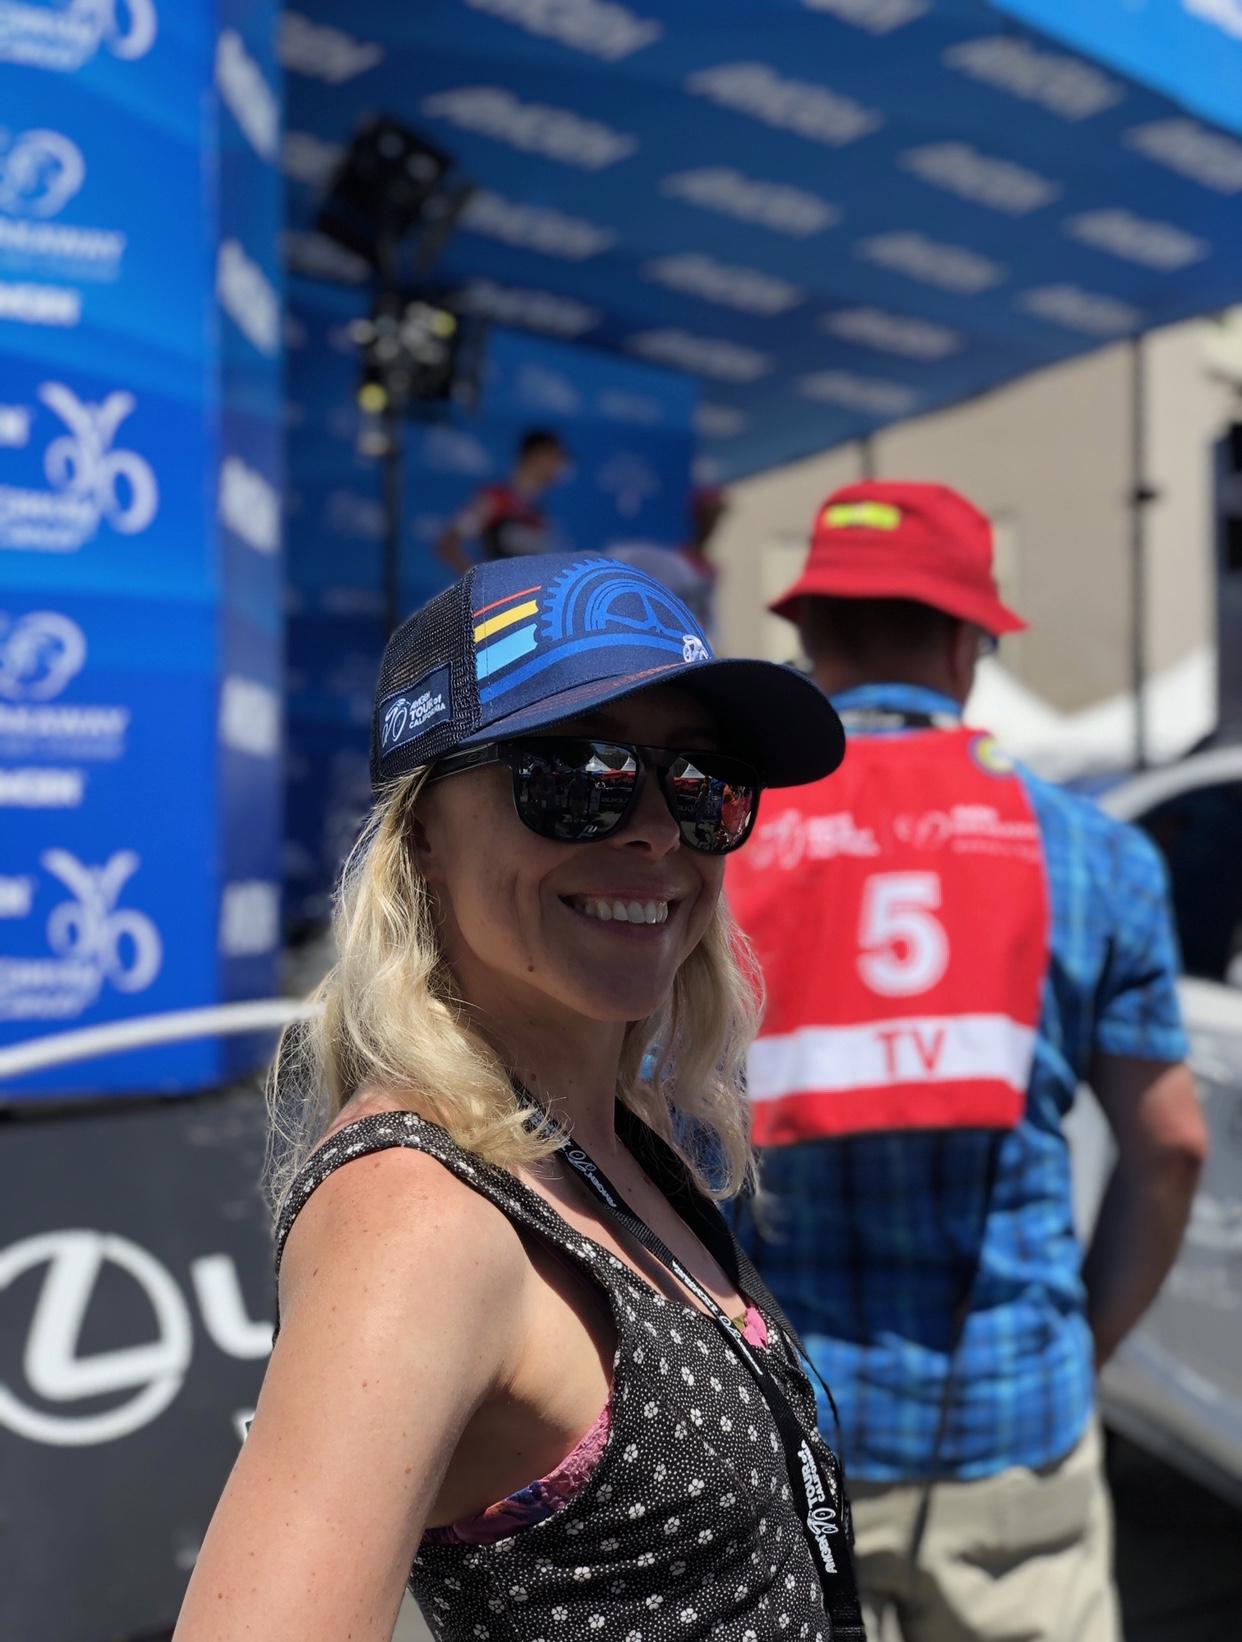 2018 Tour of California Advanced Team Lead